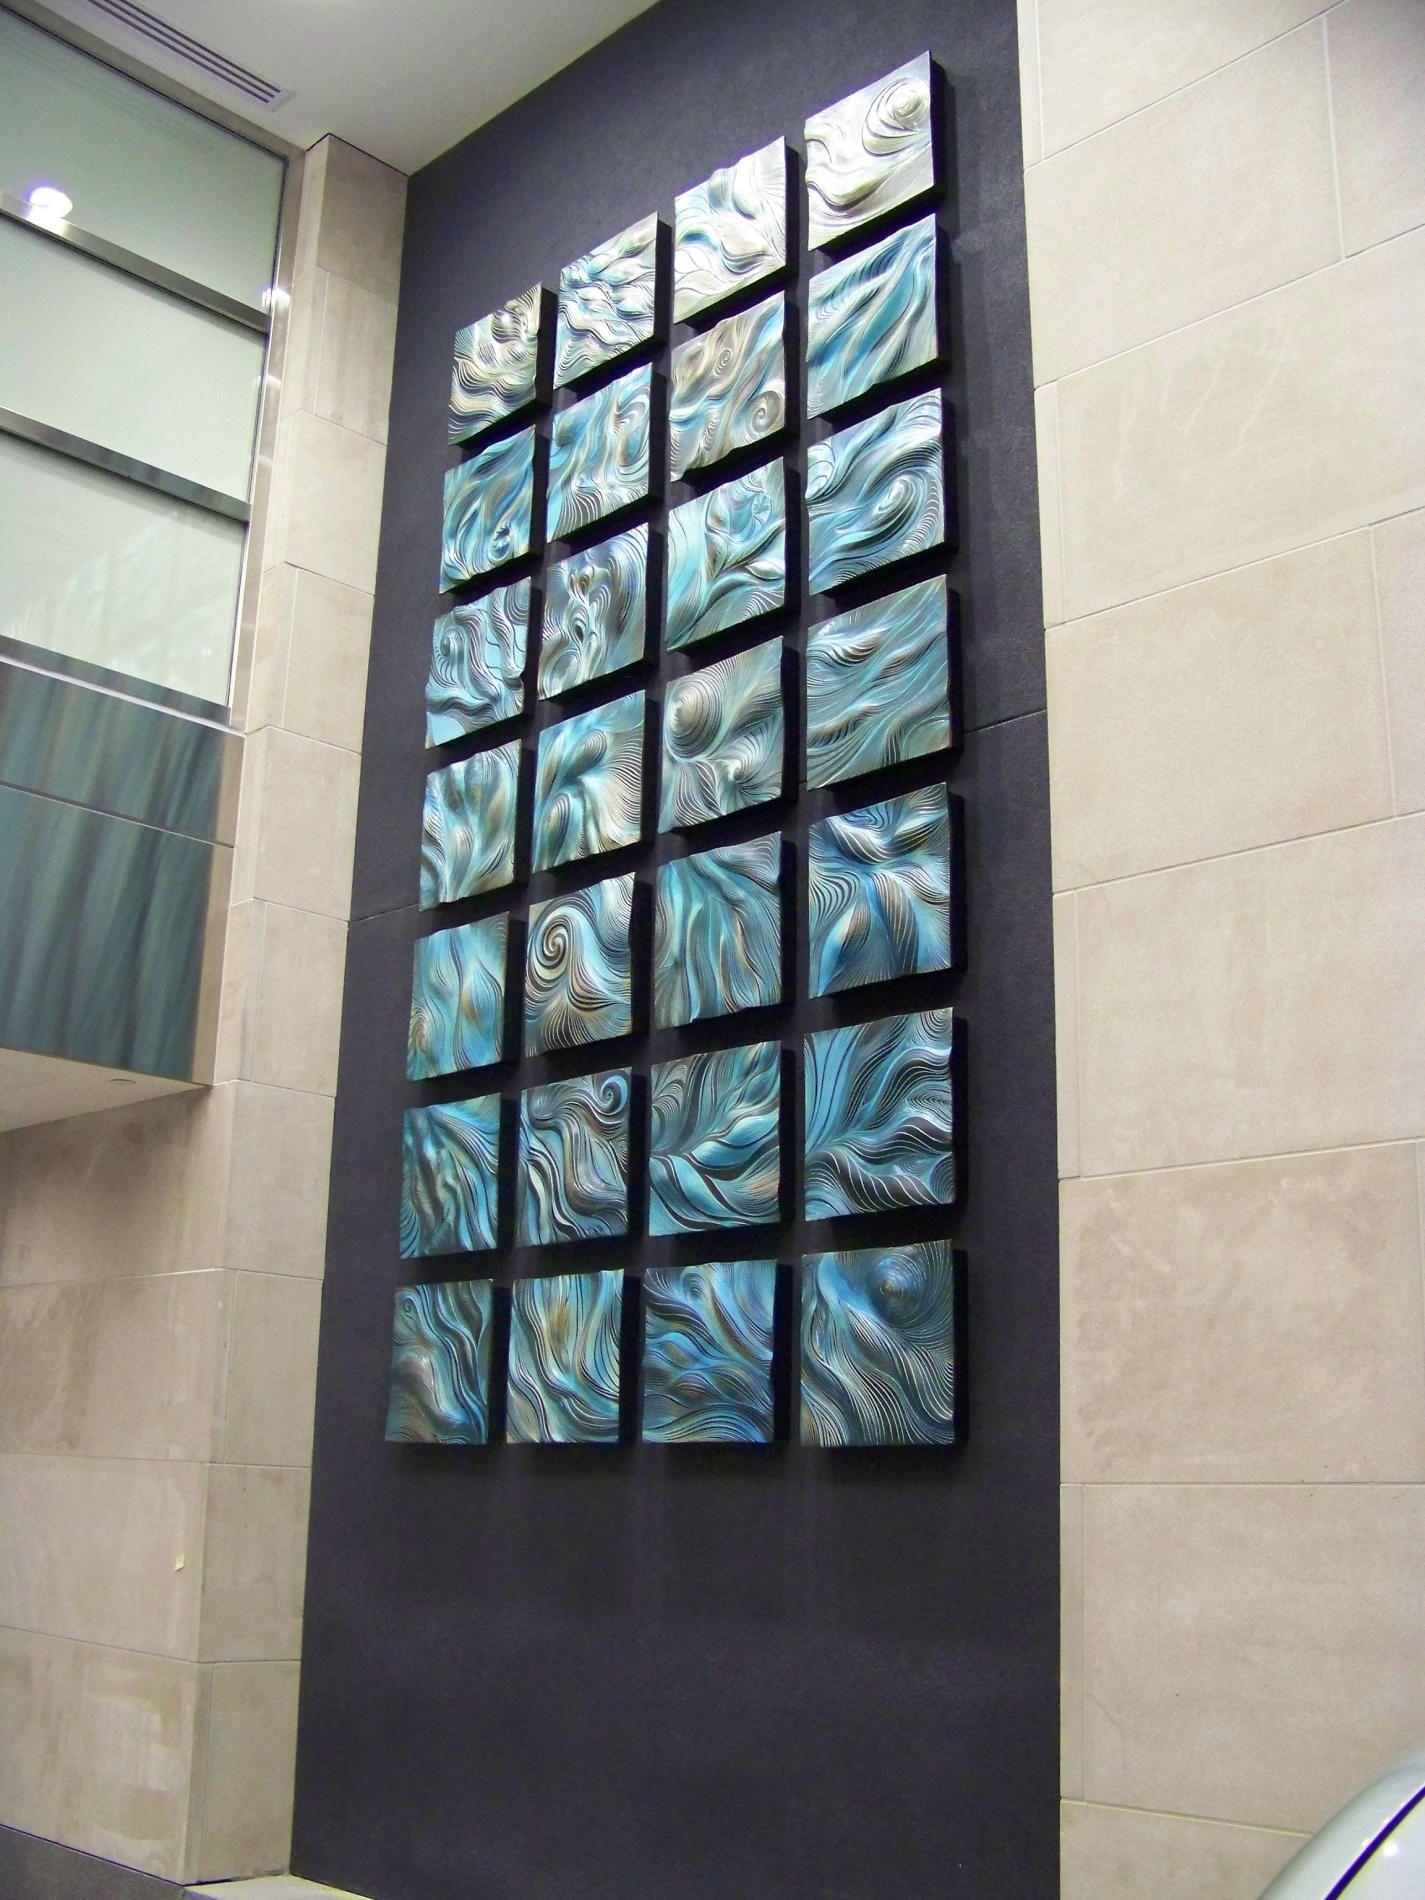 Delicieux Natalie Blake Studios   Installation Shots Of Sculptural Wall Art Tile